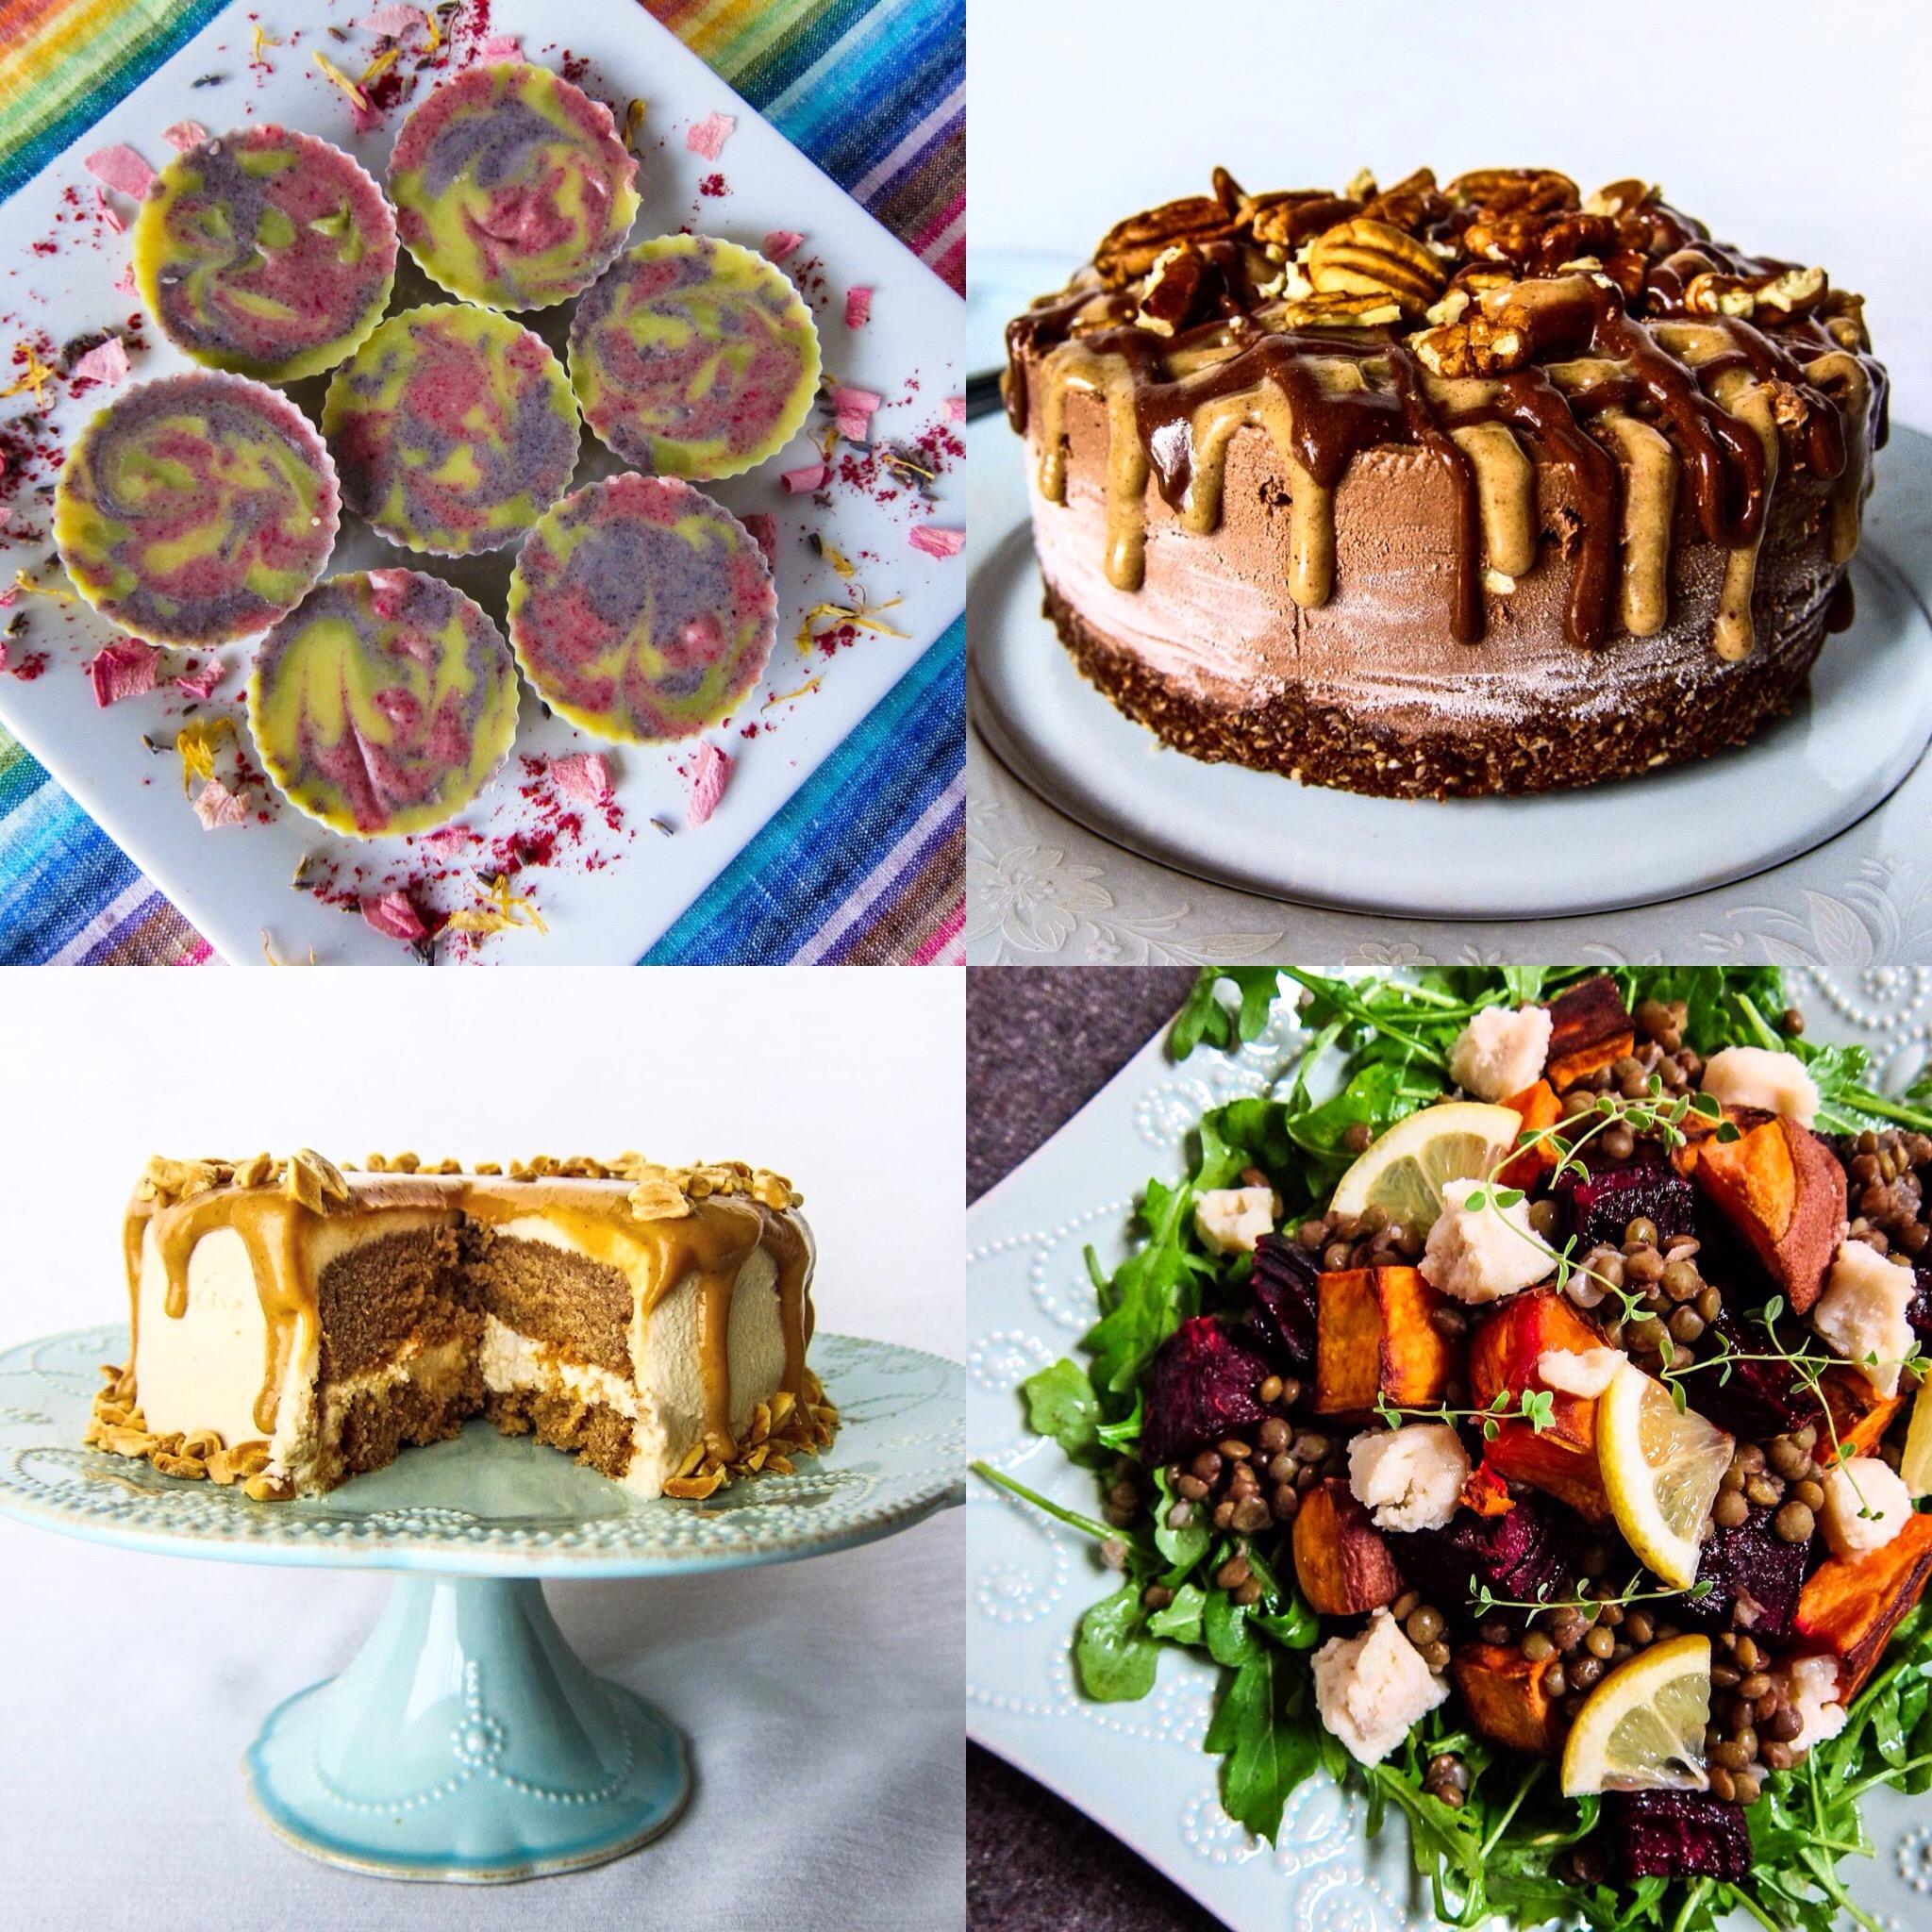 Top 15 Recipes of 2017 From Fragrant Vanilla Cake